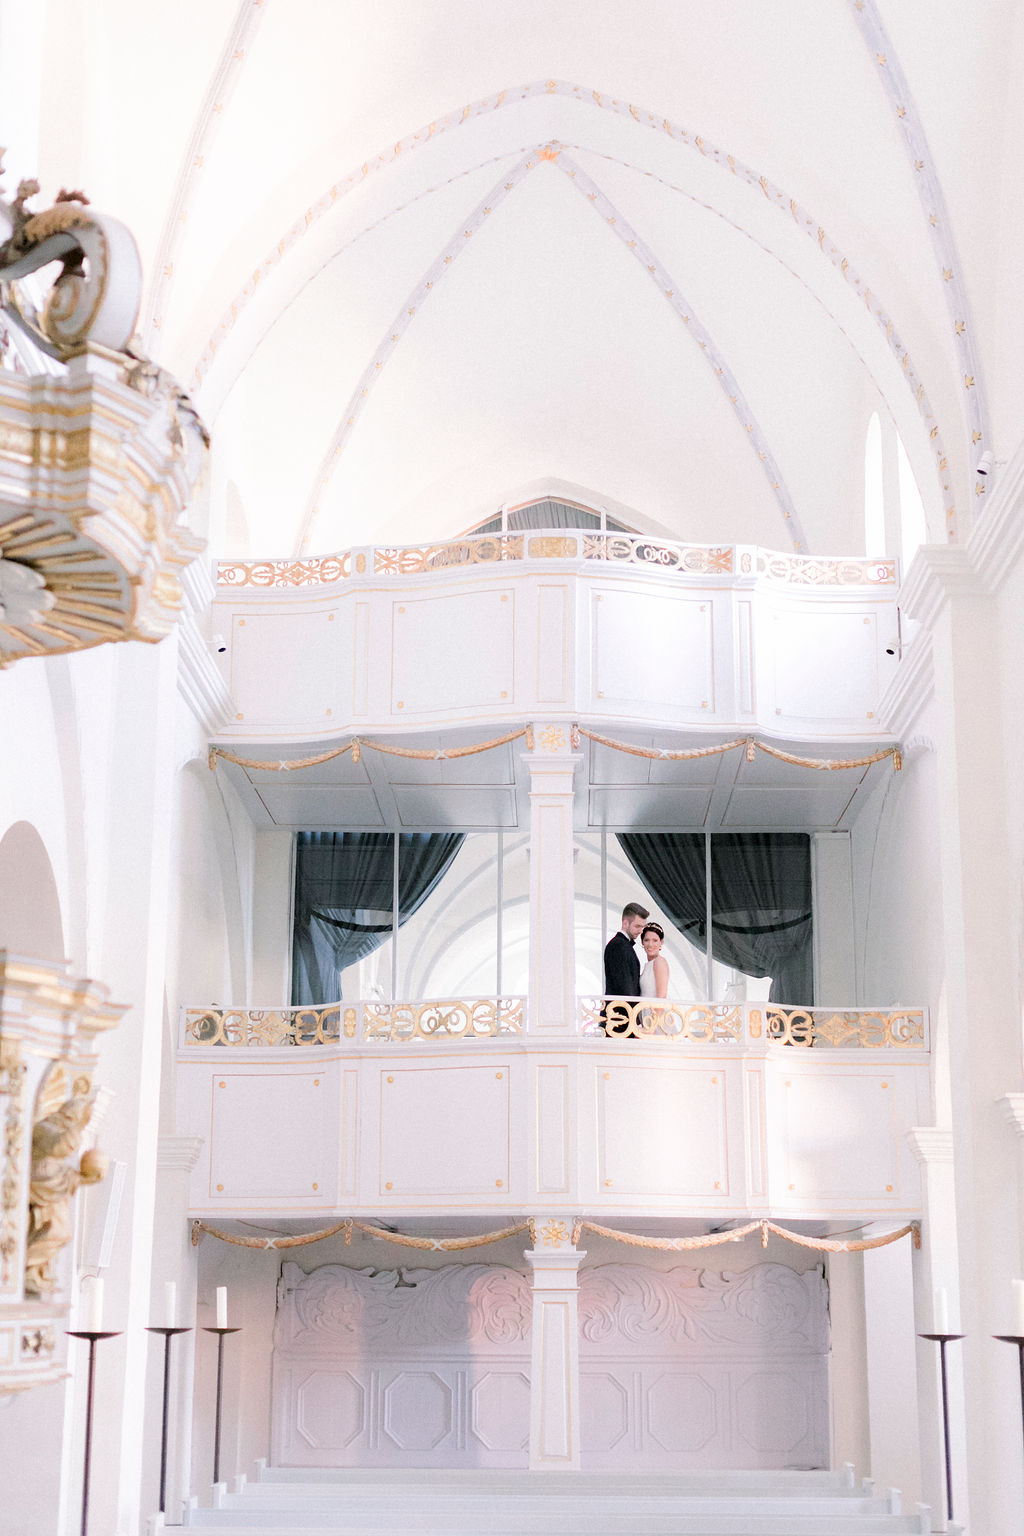 kloster wööltingerode, wedding venue in germany, destination wedding germany, monastery germany